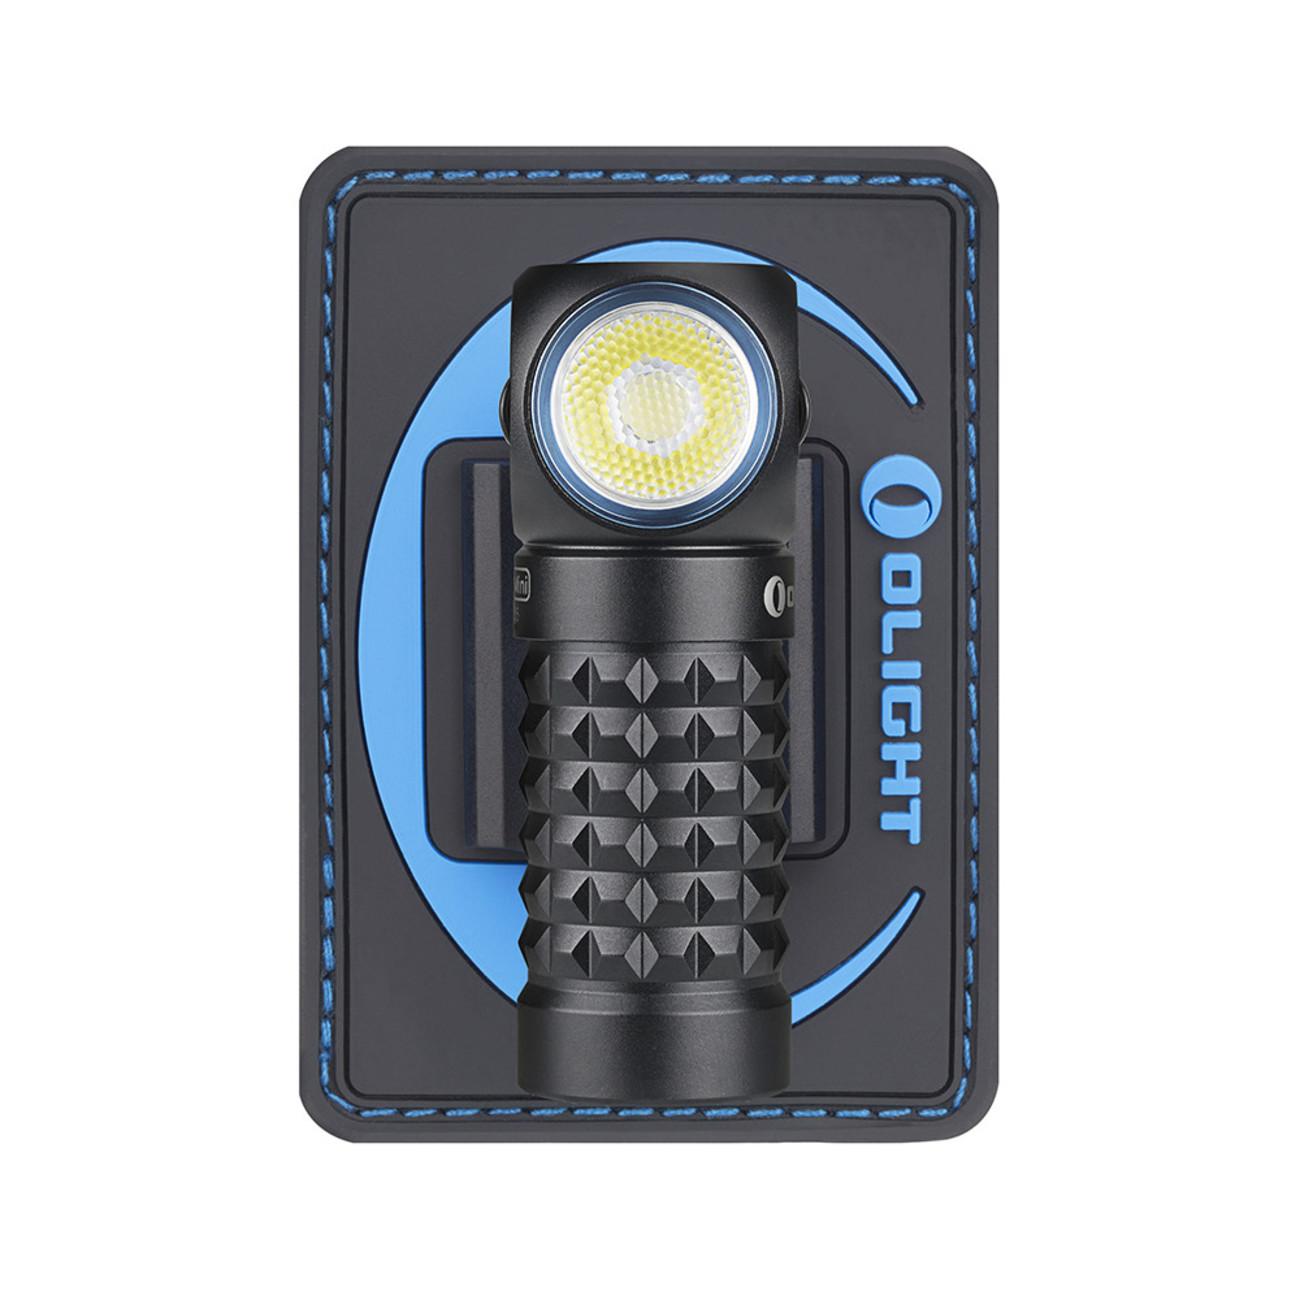 Perun Mini LED Taschenlampe - Schwarz